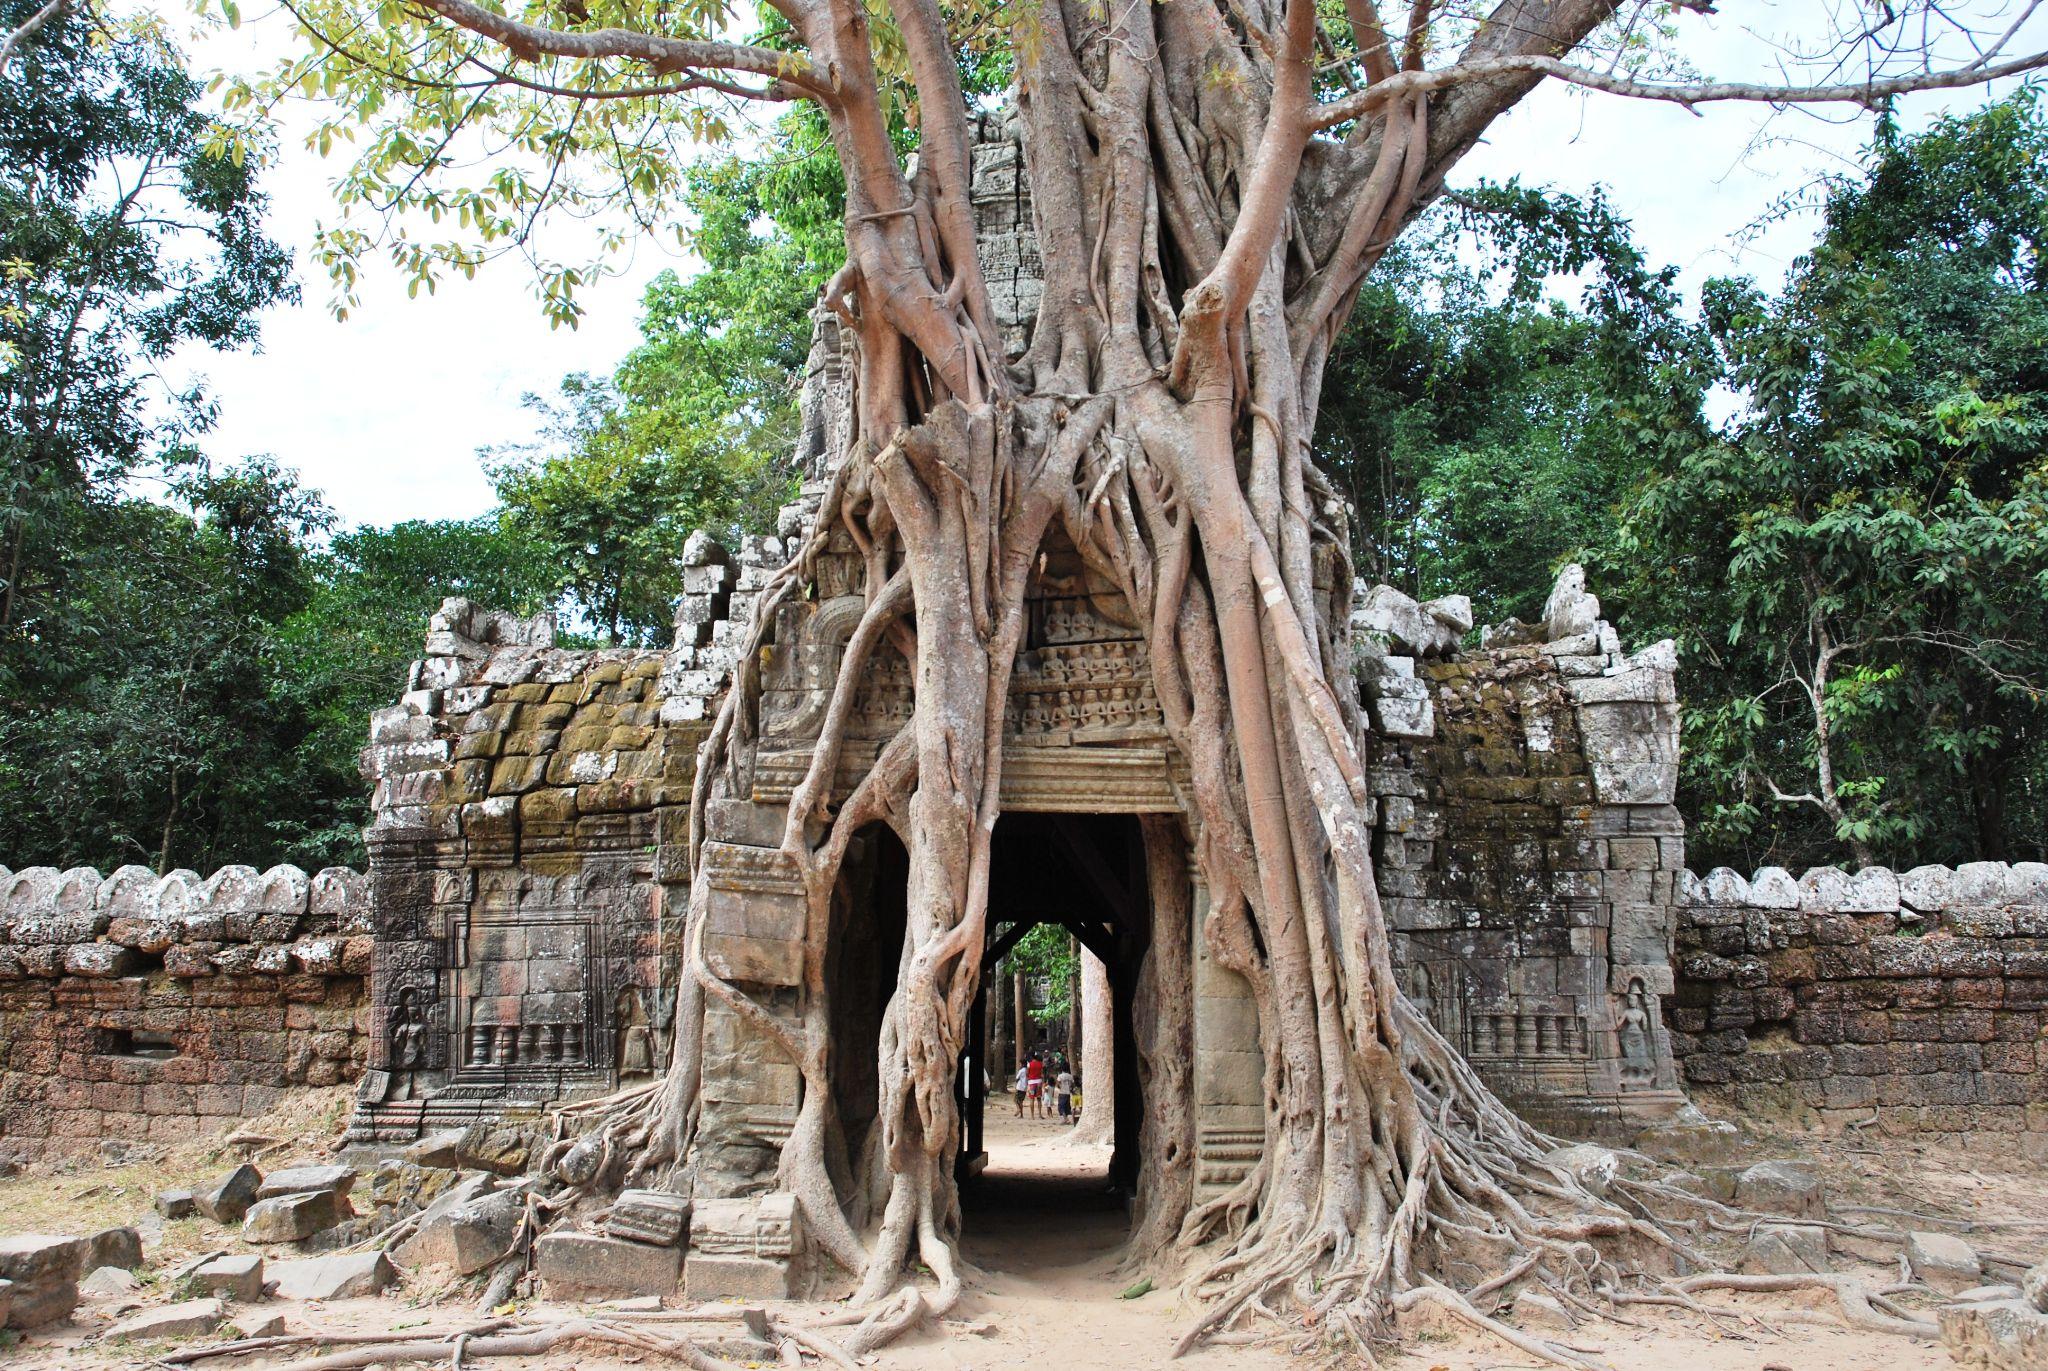 Cambogia by frankska63